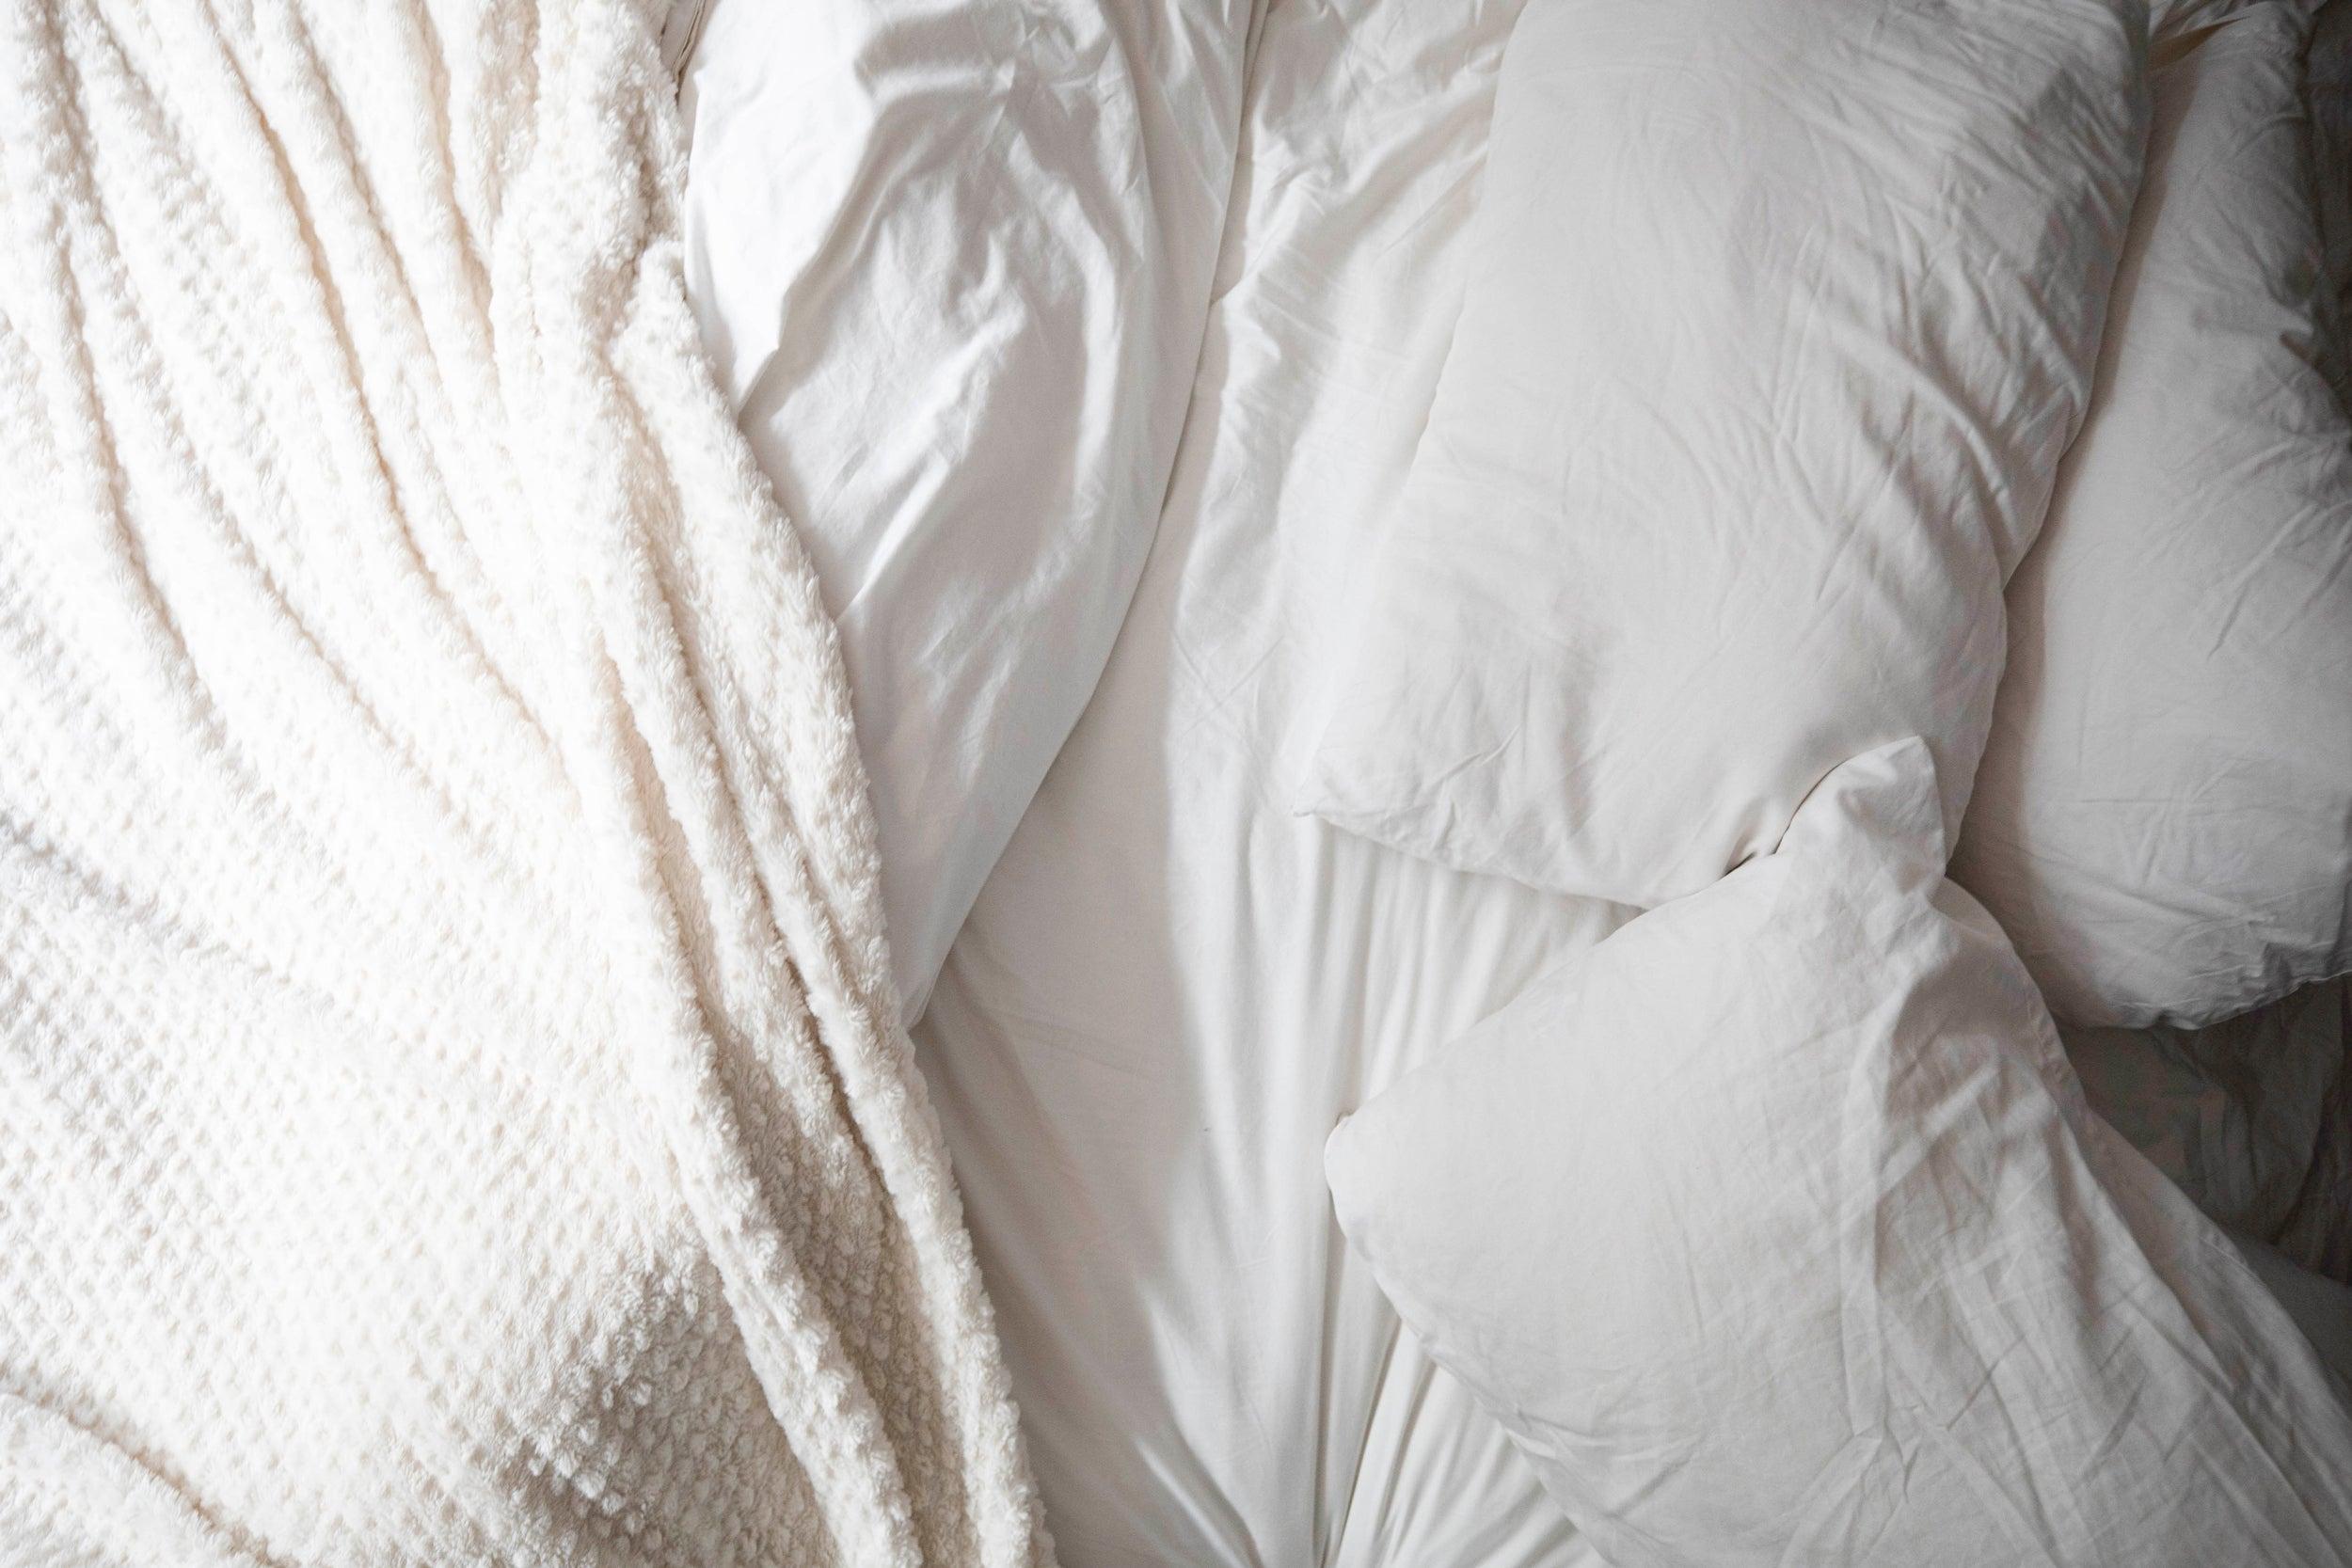 Pillows and sheets.